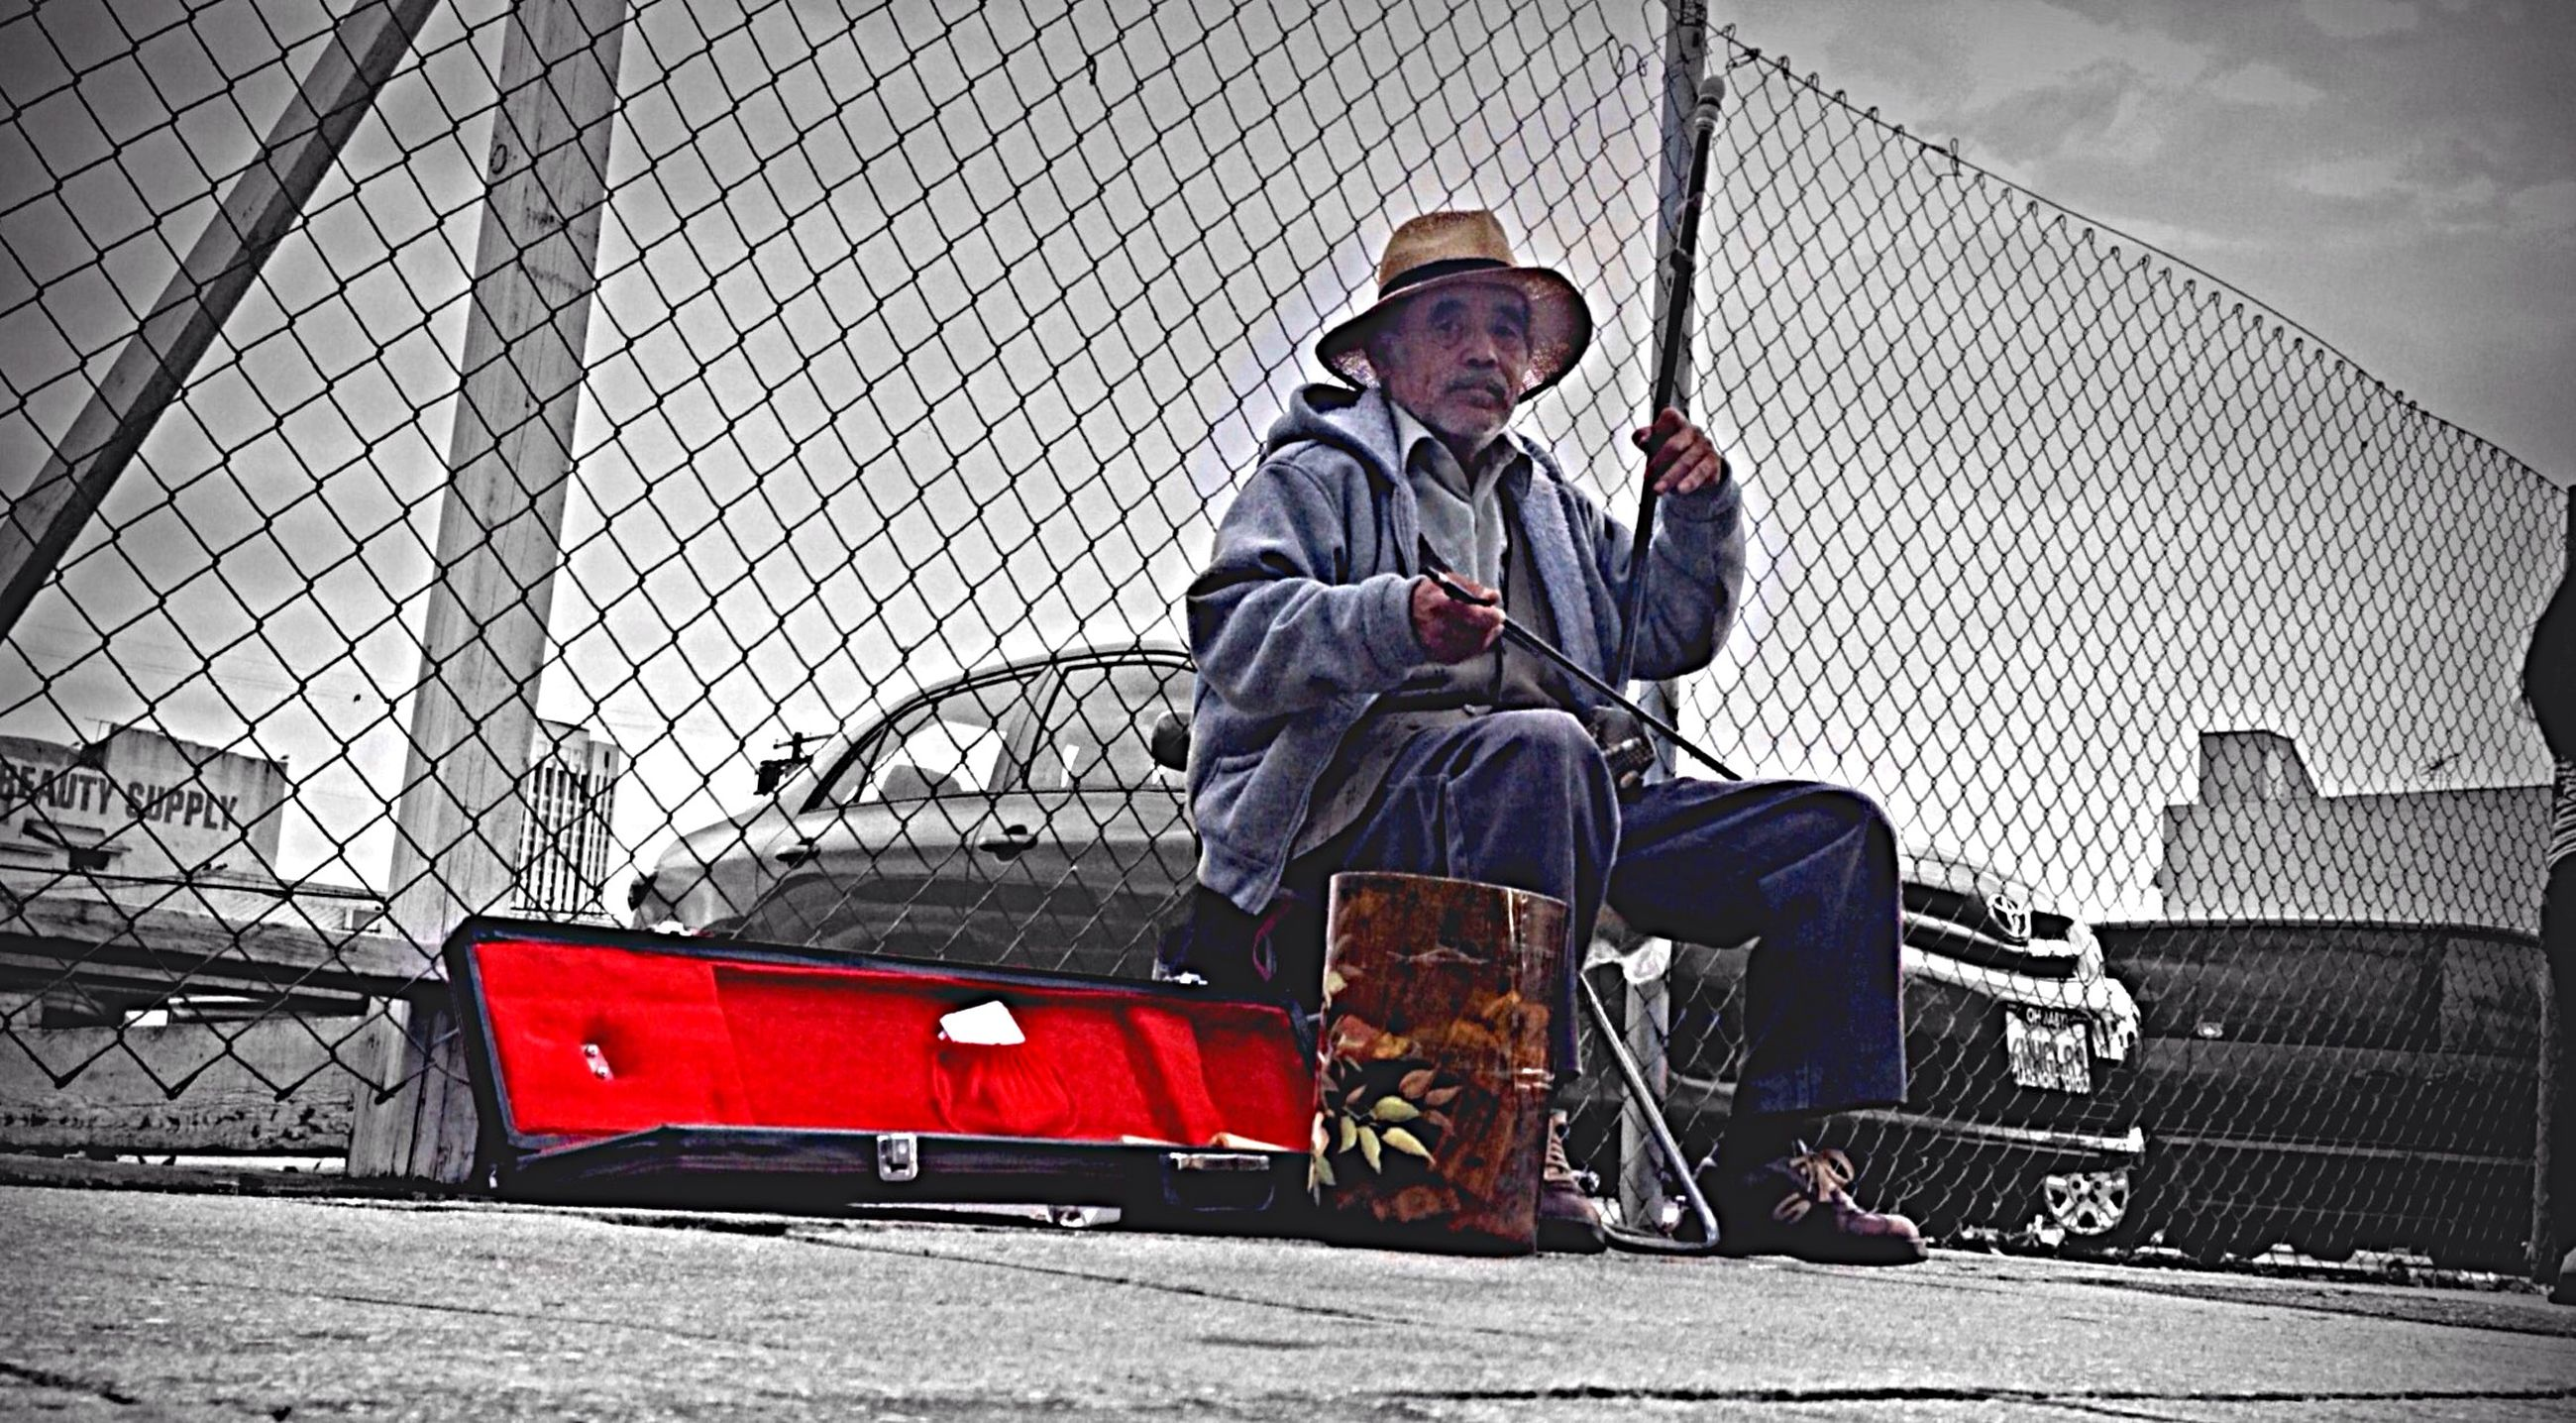 human representation, art, building exterior, built structure, art and craft, architecture, creativity, sculpture, day, outdoors, transportation, sky, statue, street, city, metal, railing, mode of transport, full length